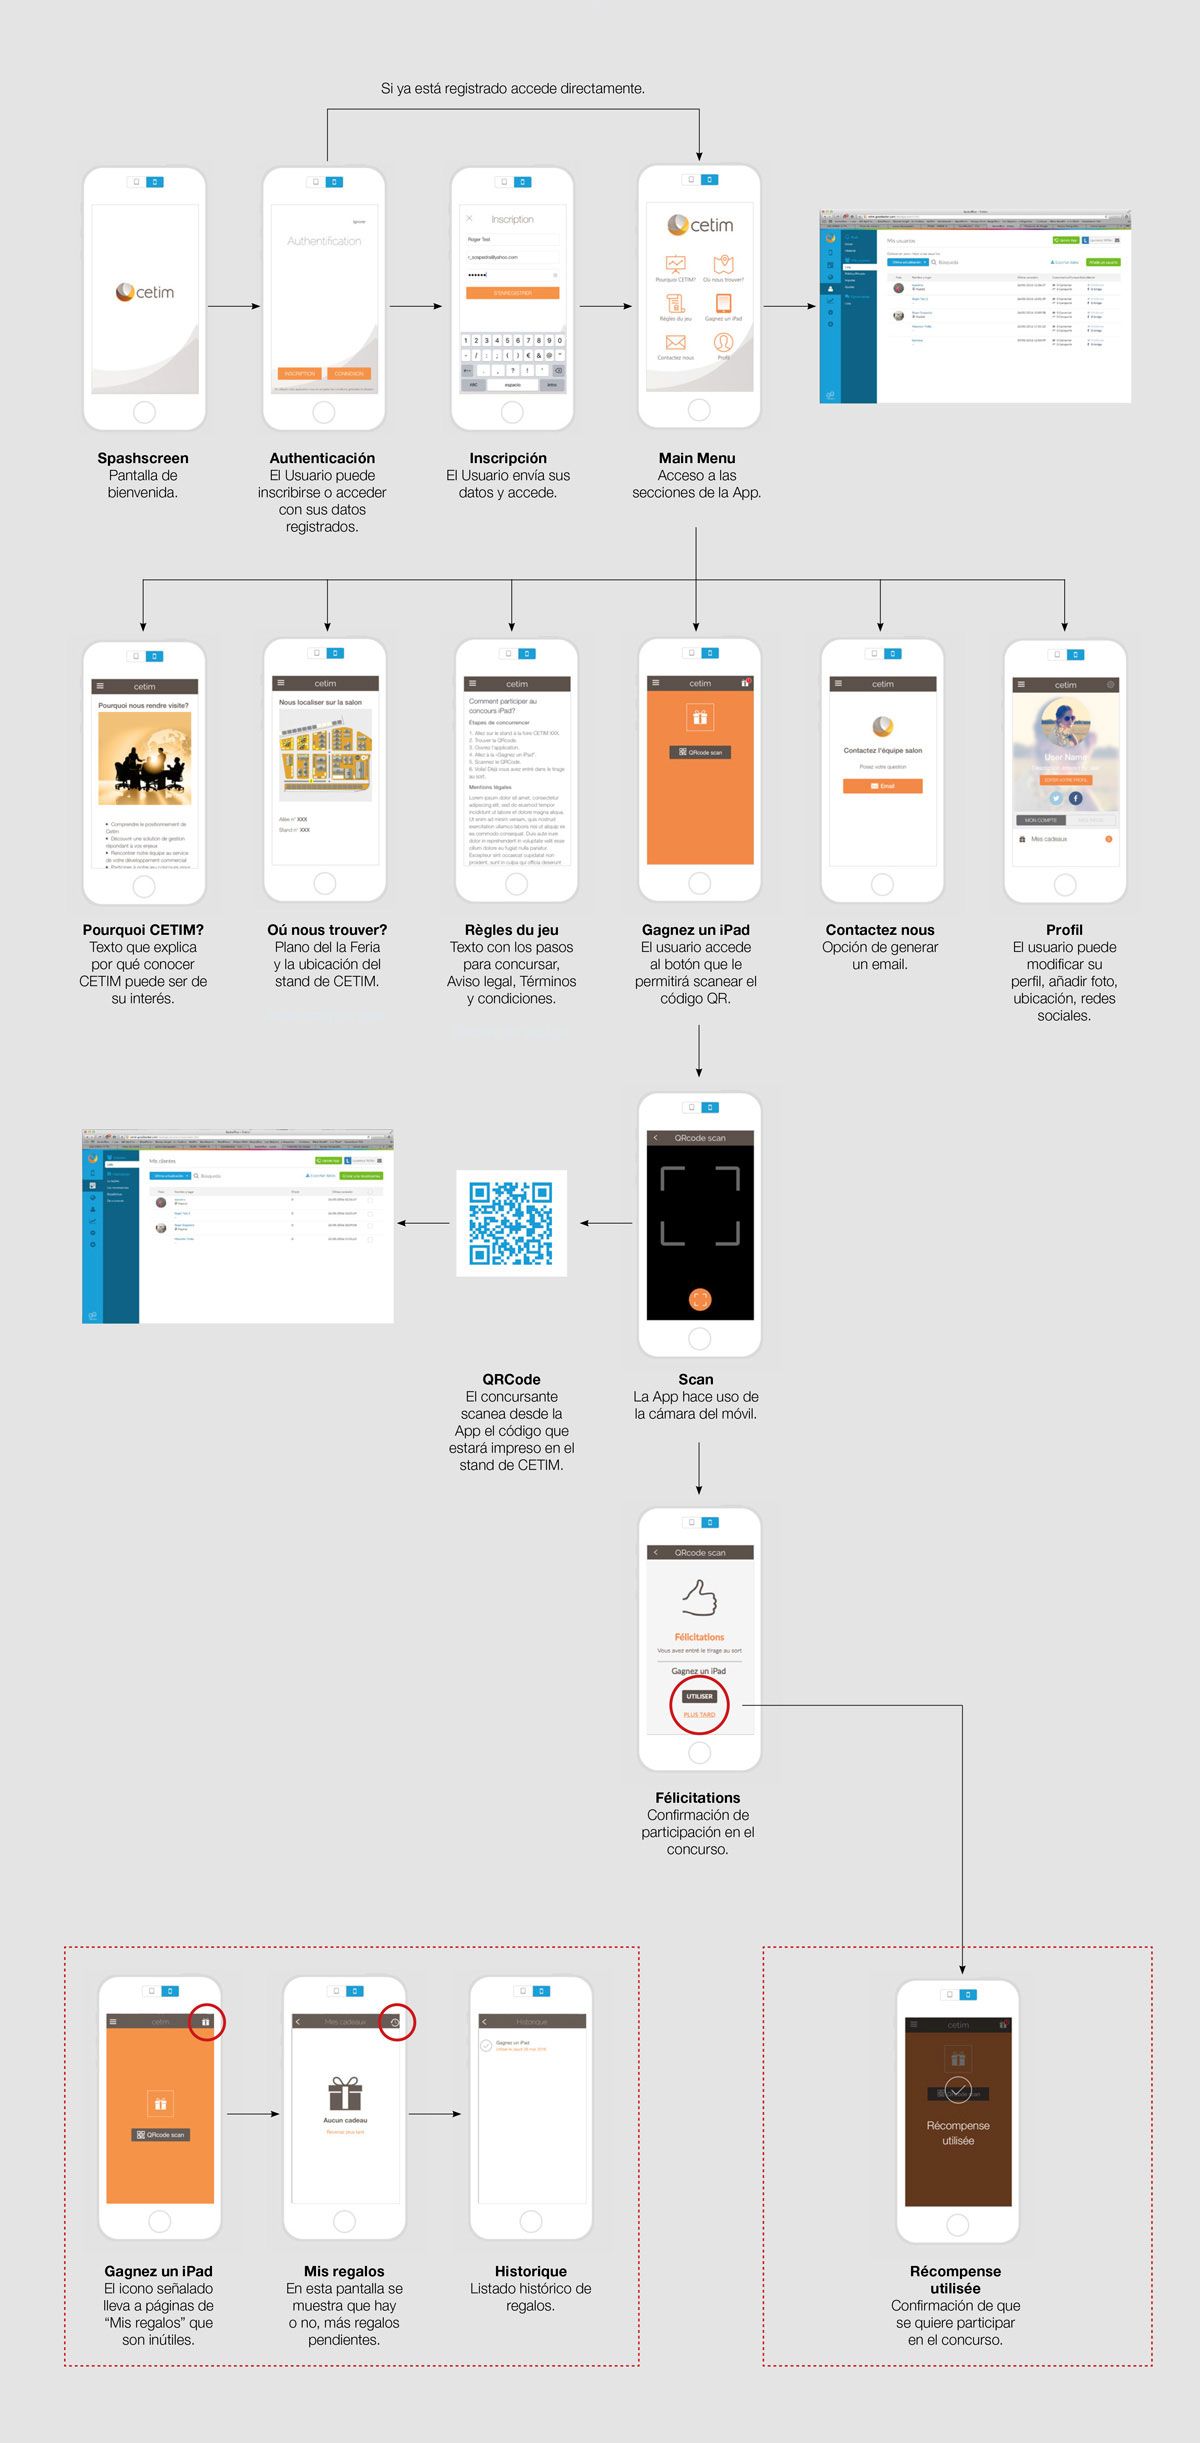 cetim-app-2